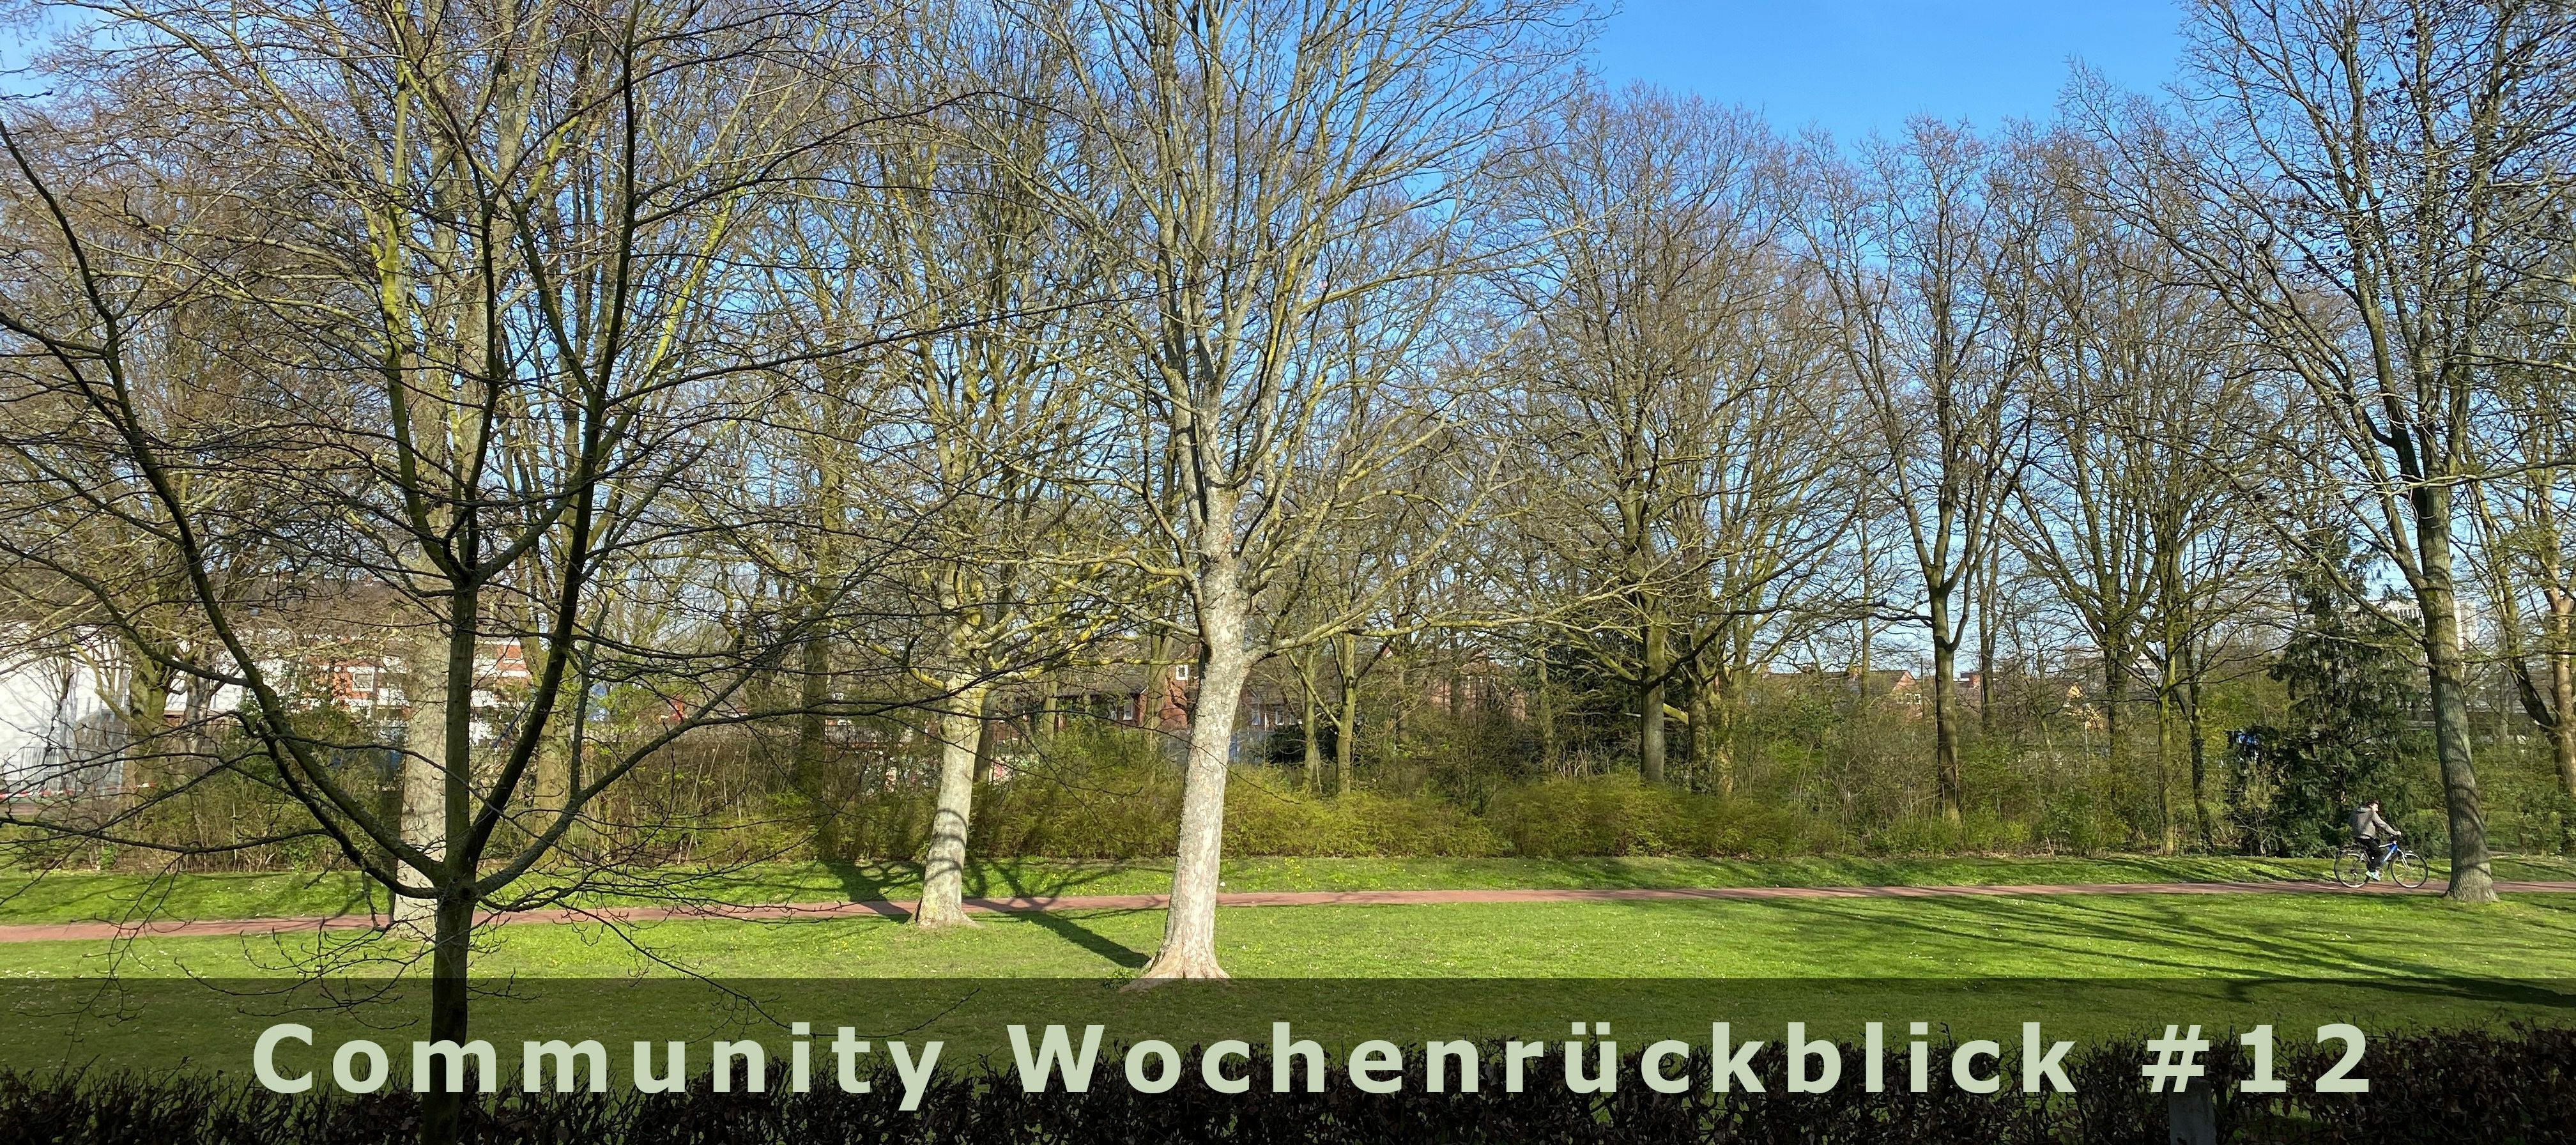 Community Wochenrückblick #12